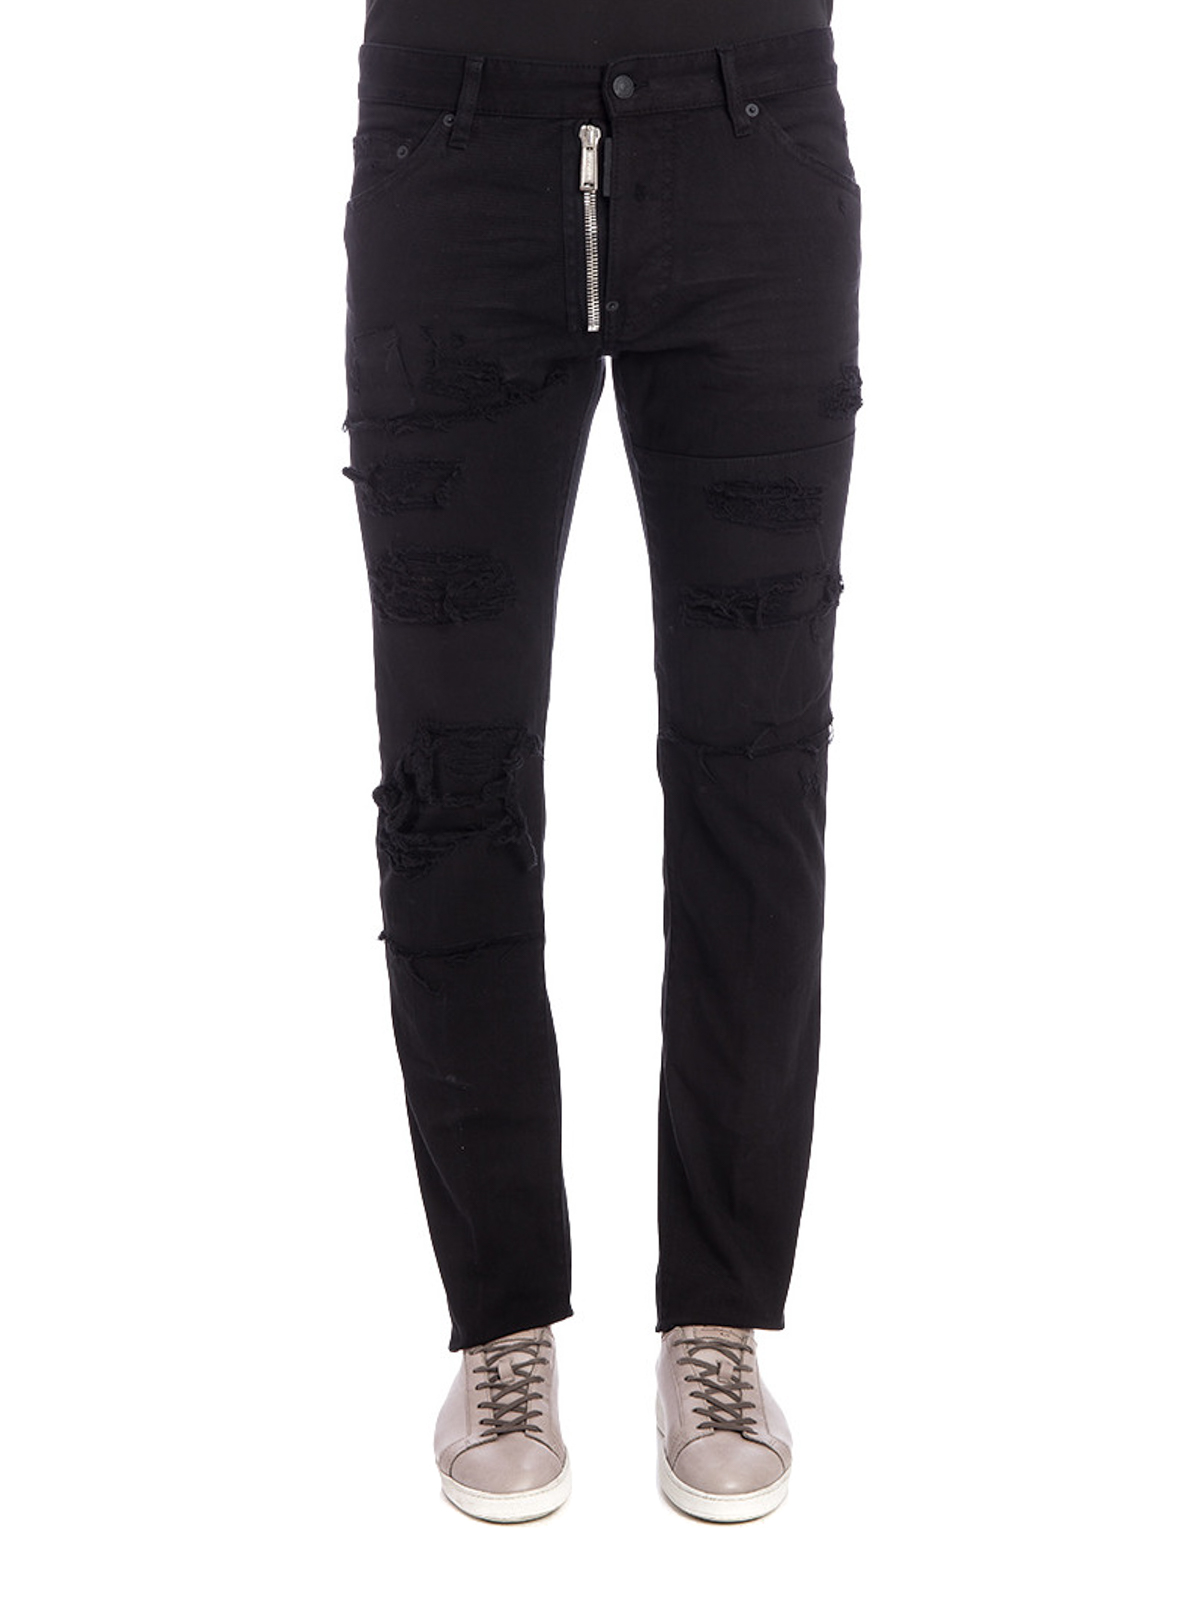 37d18f53031 DSQUARED2  skinny jeans online - Distressed coloured denim jeans